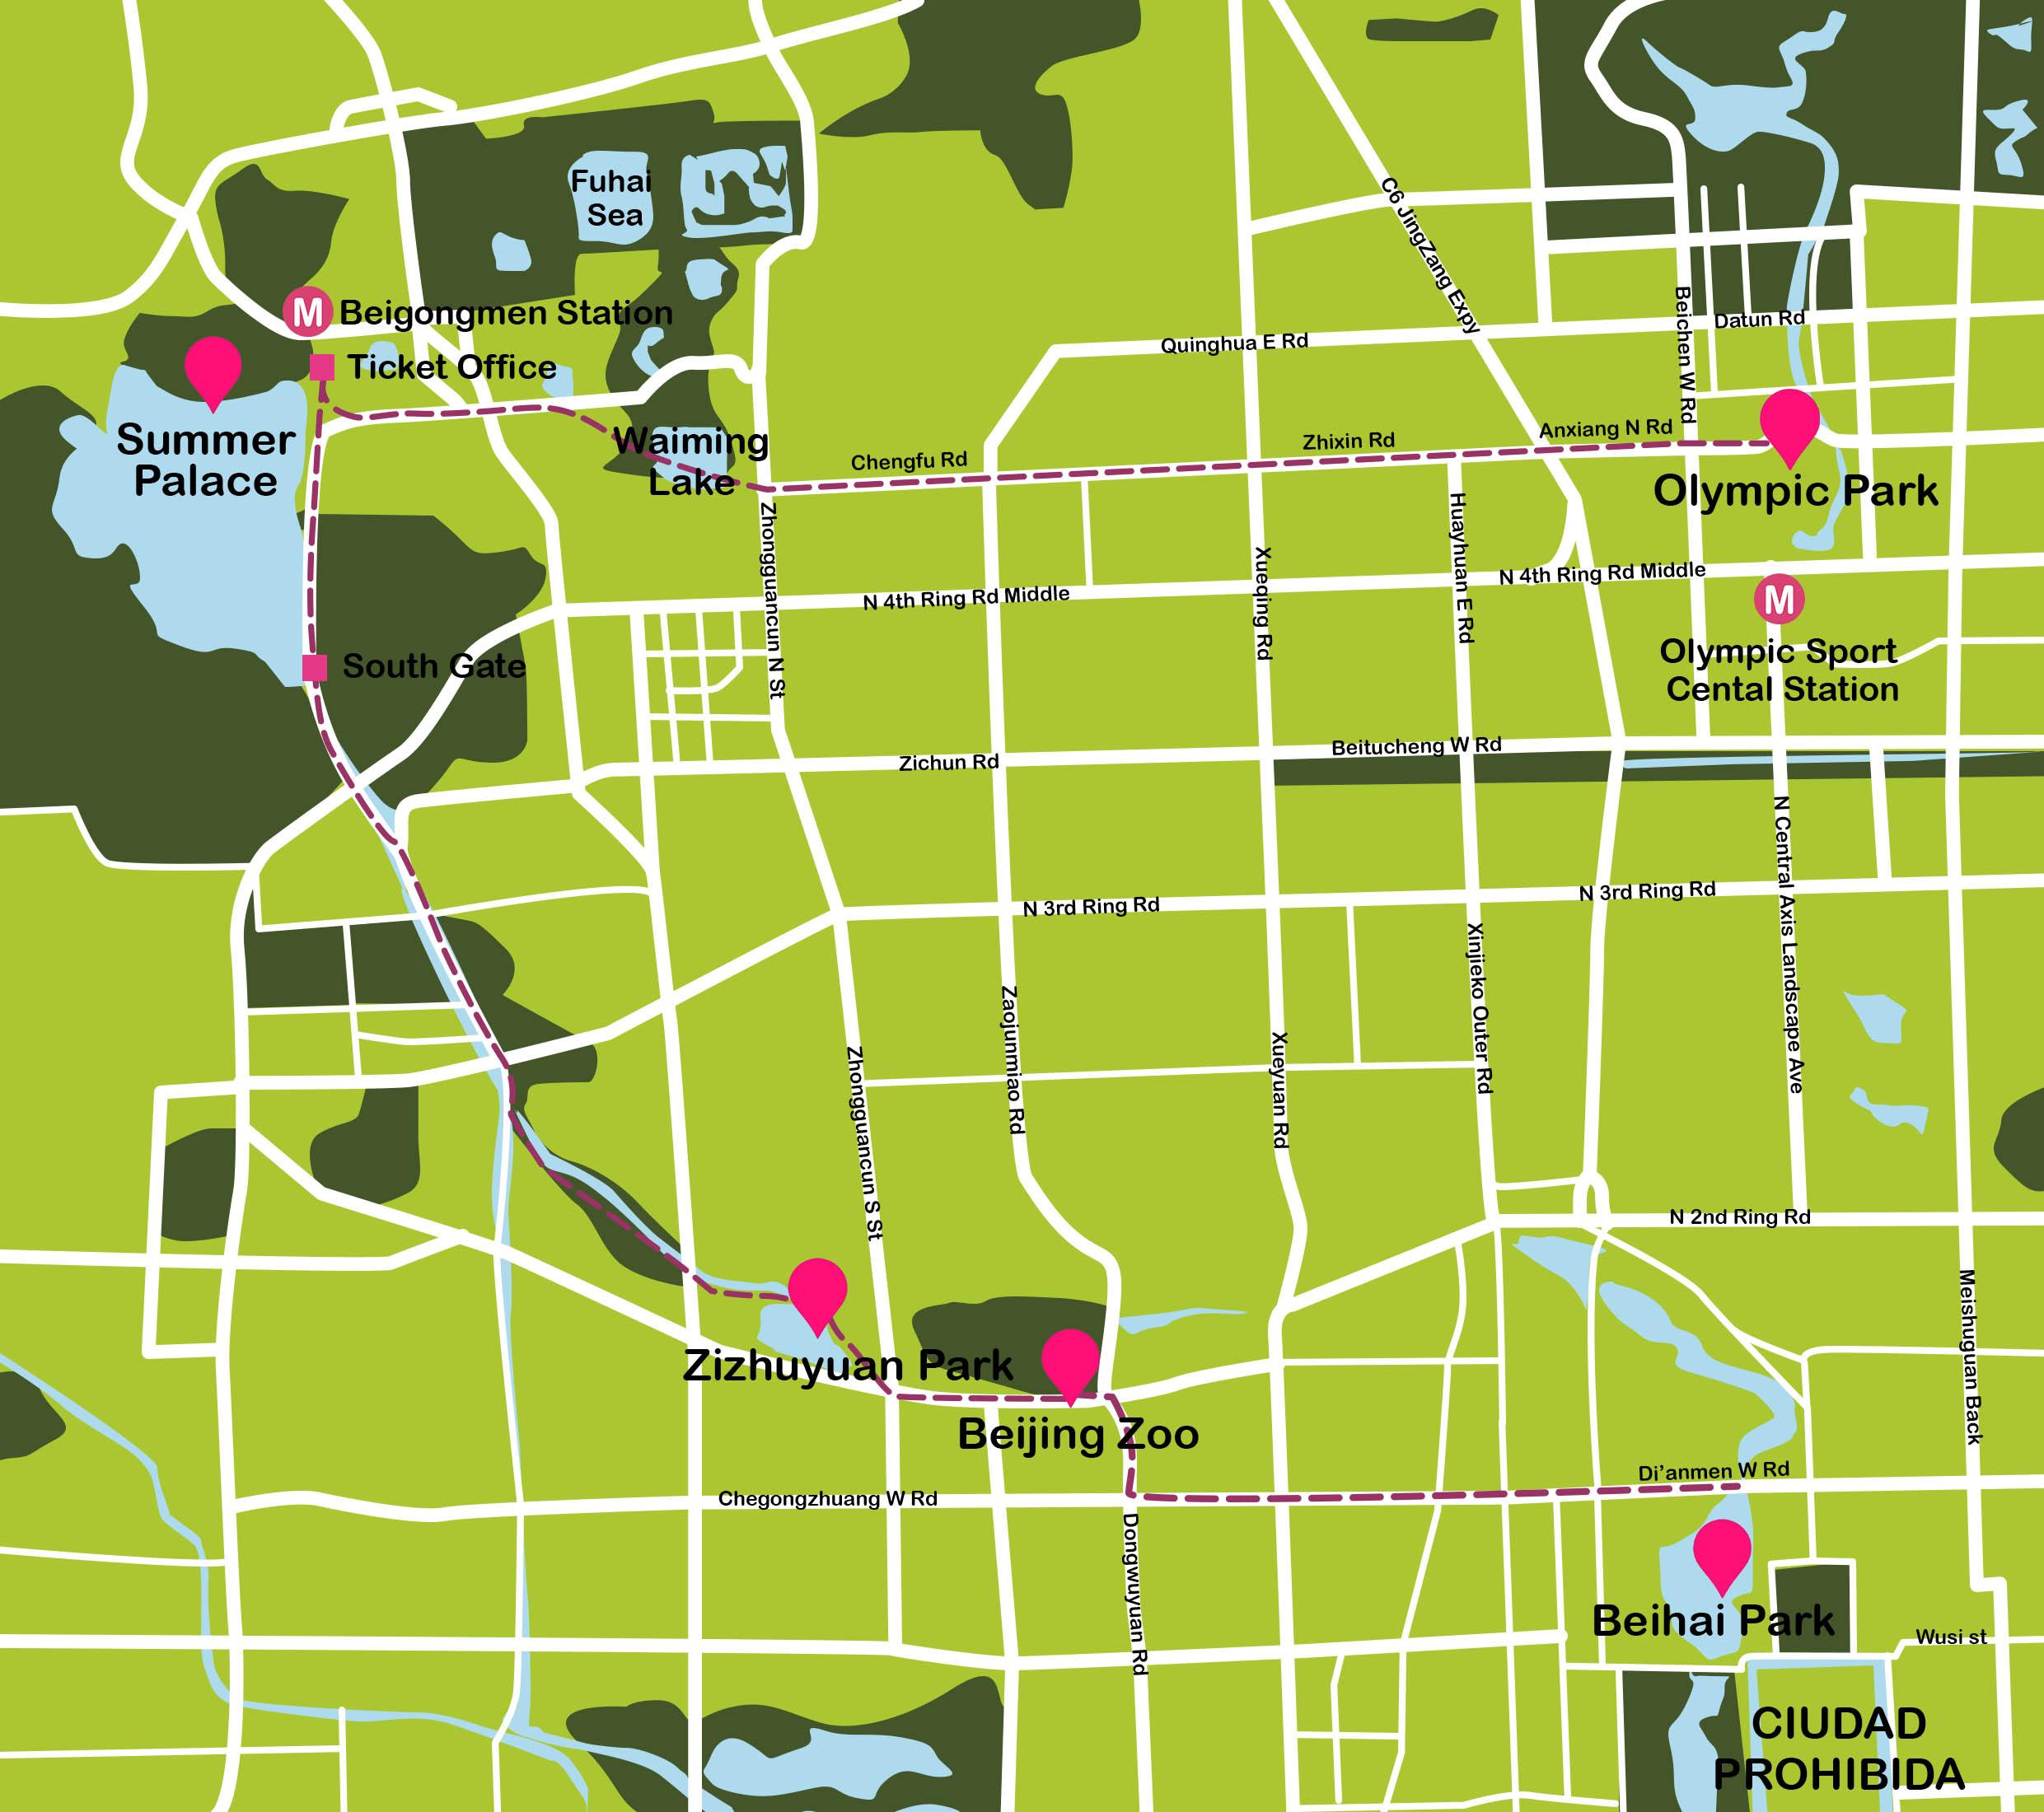 Mapa de Pekín. Summer Palace:Ruta en bicicleta #onlyes